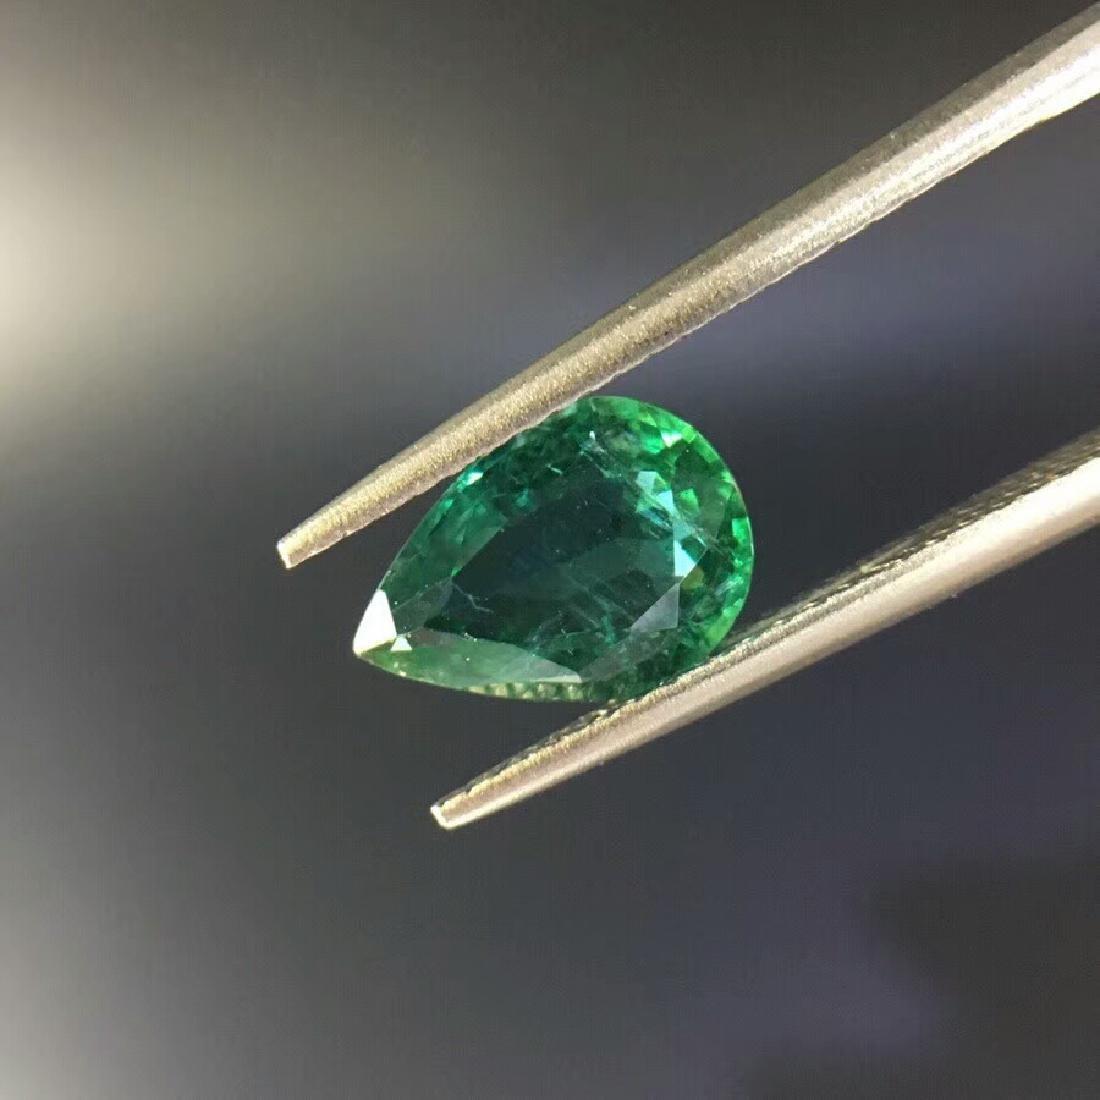 1.57 ct Emerald 6.8*9.6*4.0 mm Pear Cut - 2